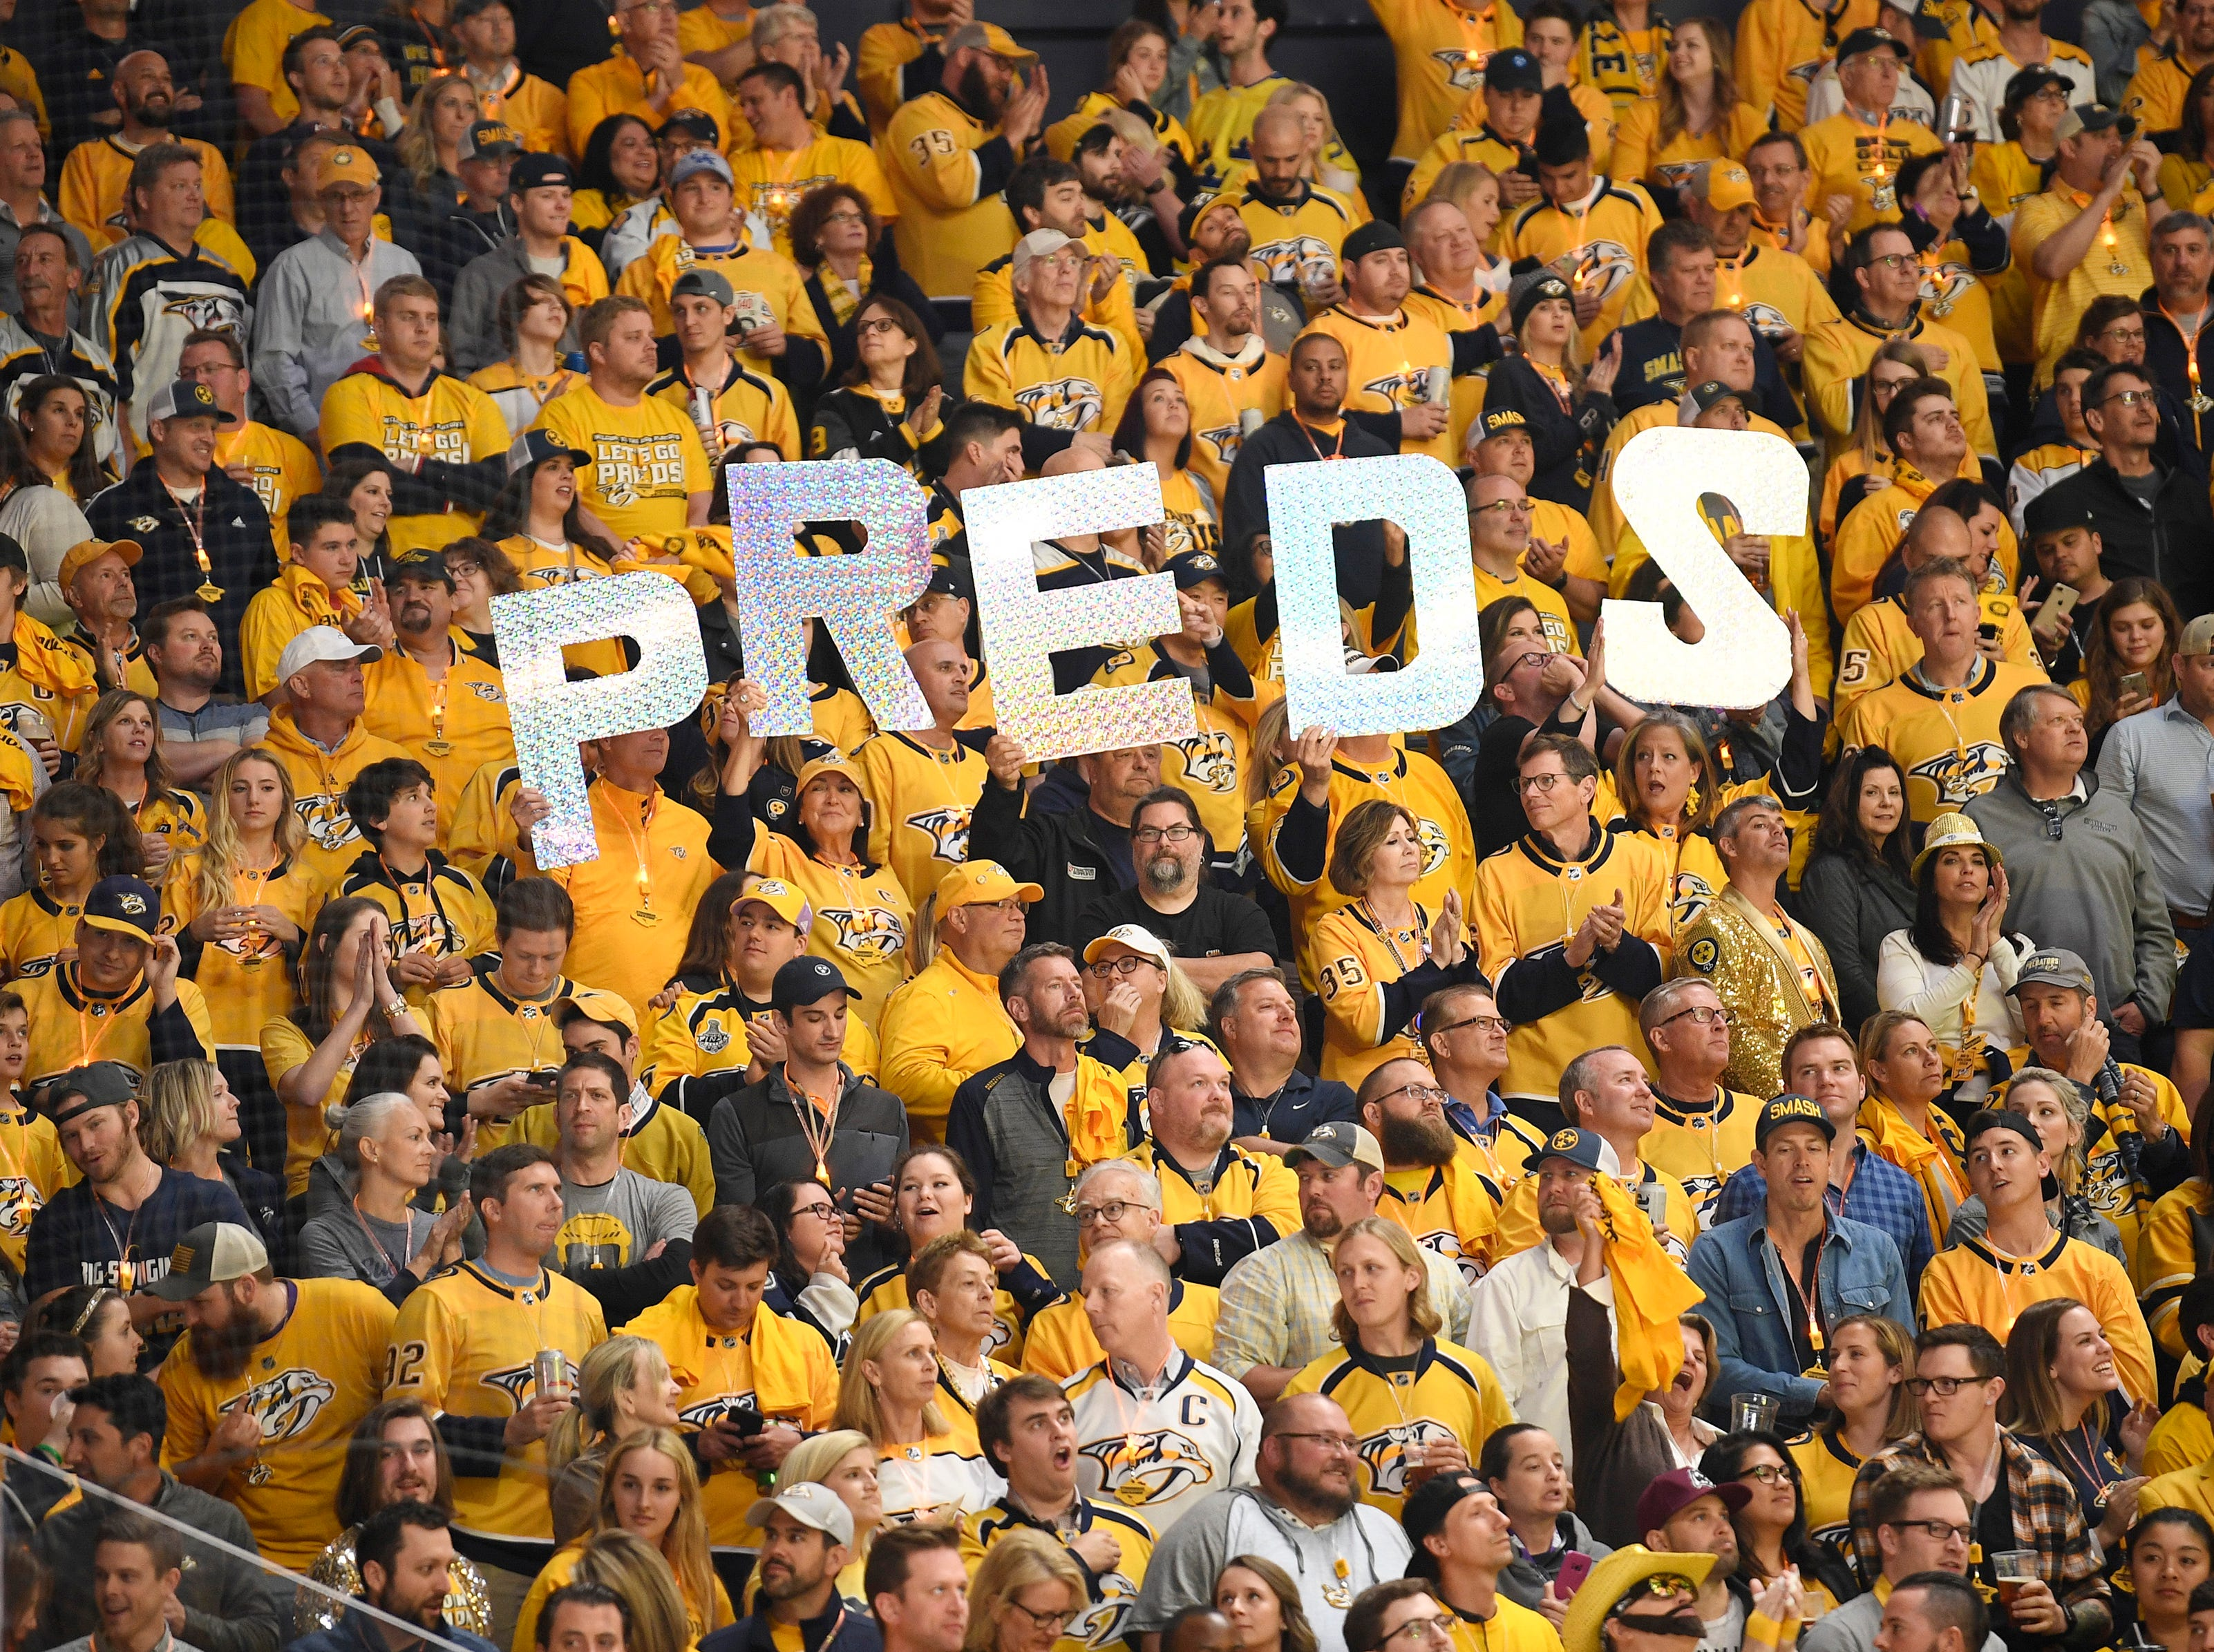 Predators fans show their spirit during the divisional semifinal game against the Dallas Stars at Bridgestone Arena in Nashville, Tenn., Wednesday, April 10, 2019.